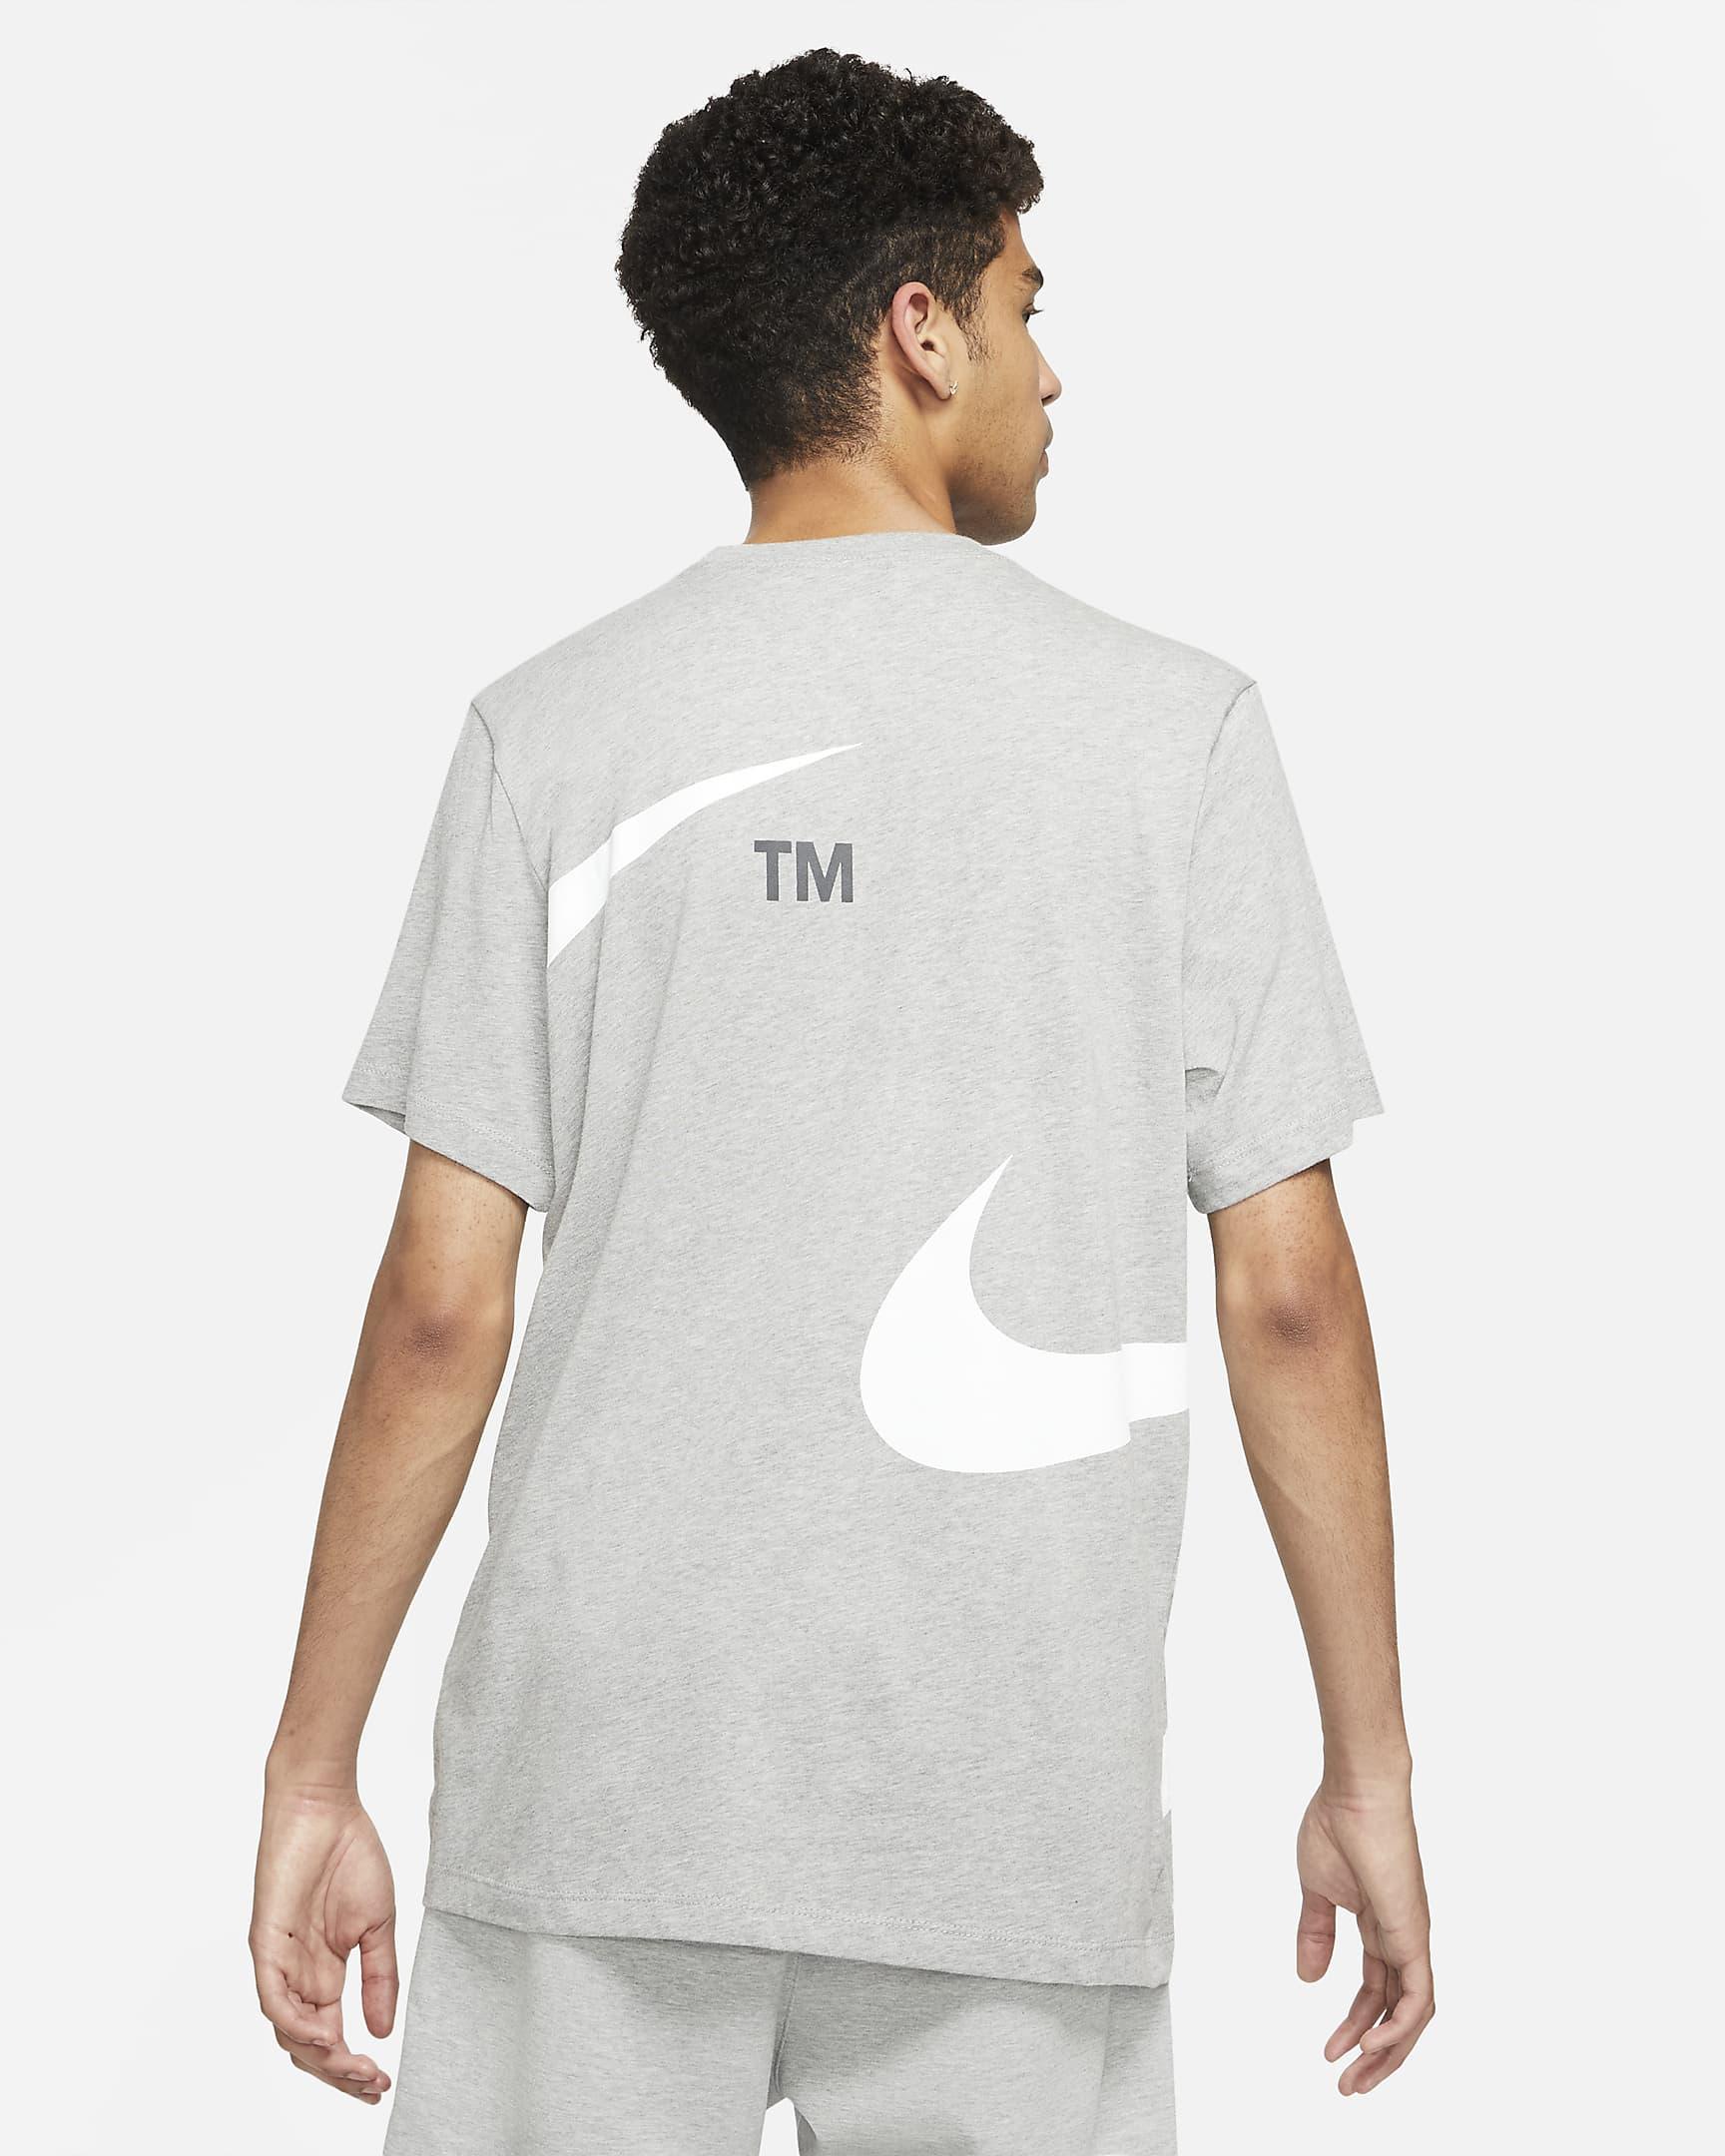 nike-sportswear-mens-t-shirt-zTB7SW-1.png